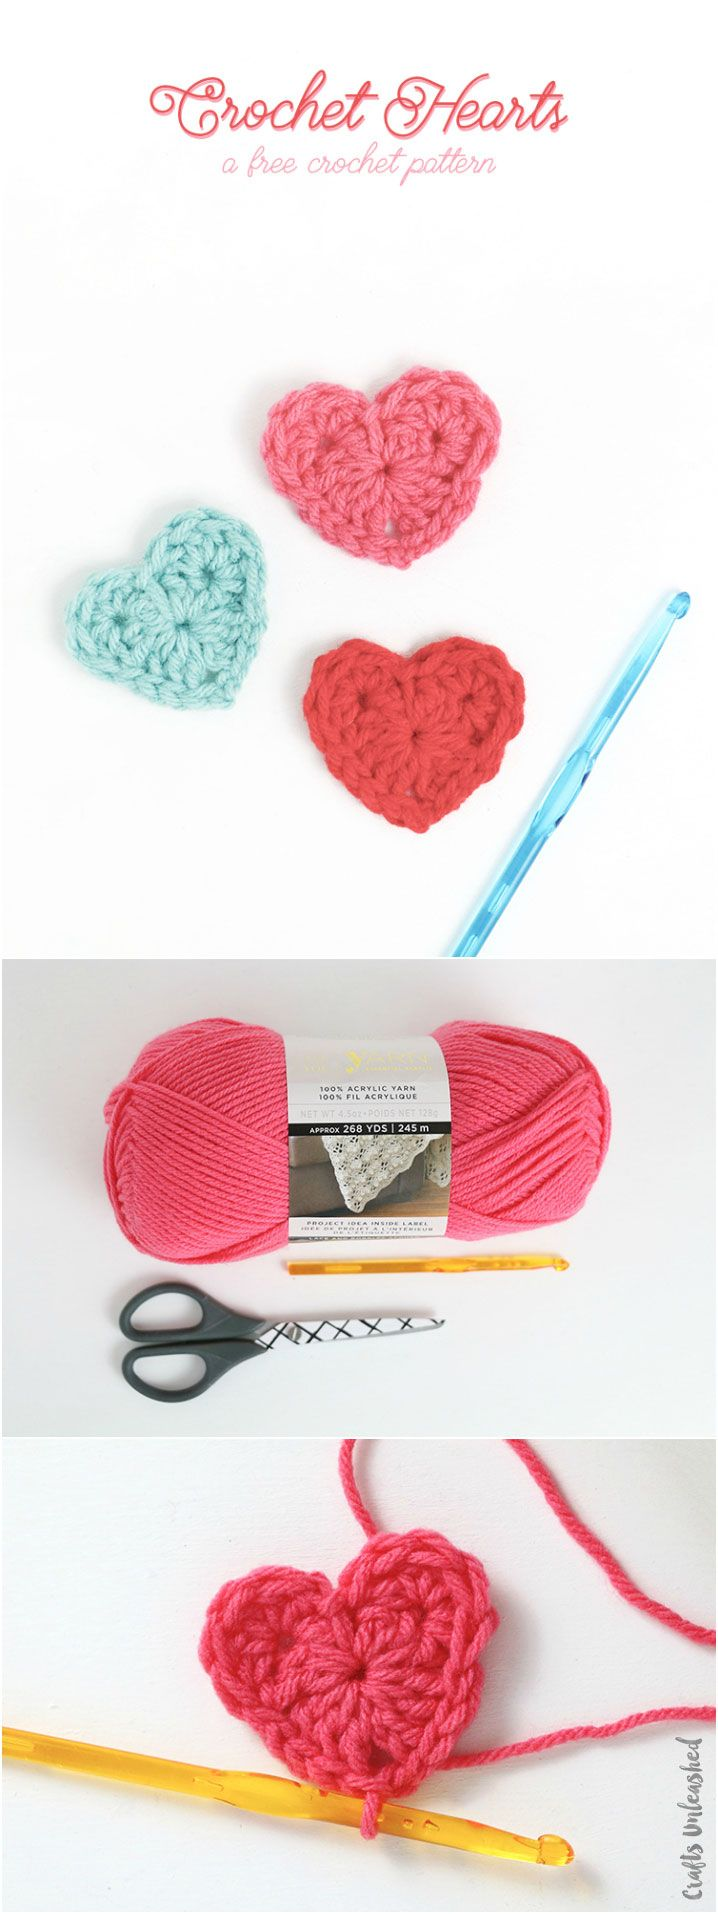 74 best Knit & Crochet images on Pinterest | Crochet free patterns ...